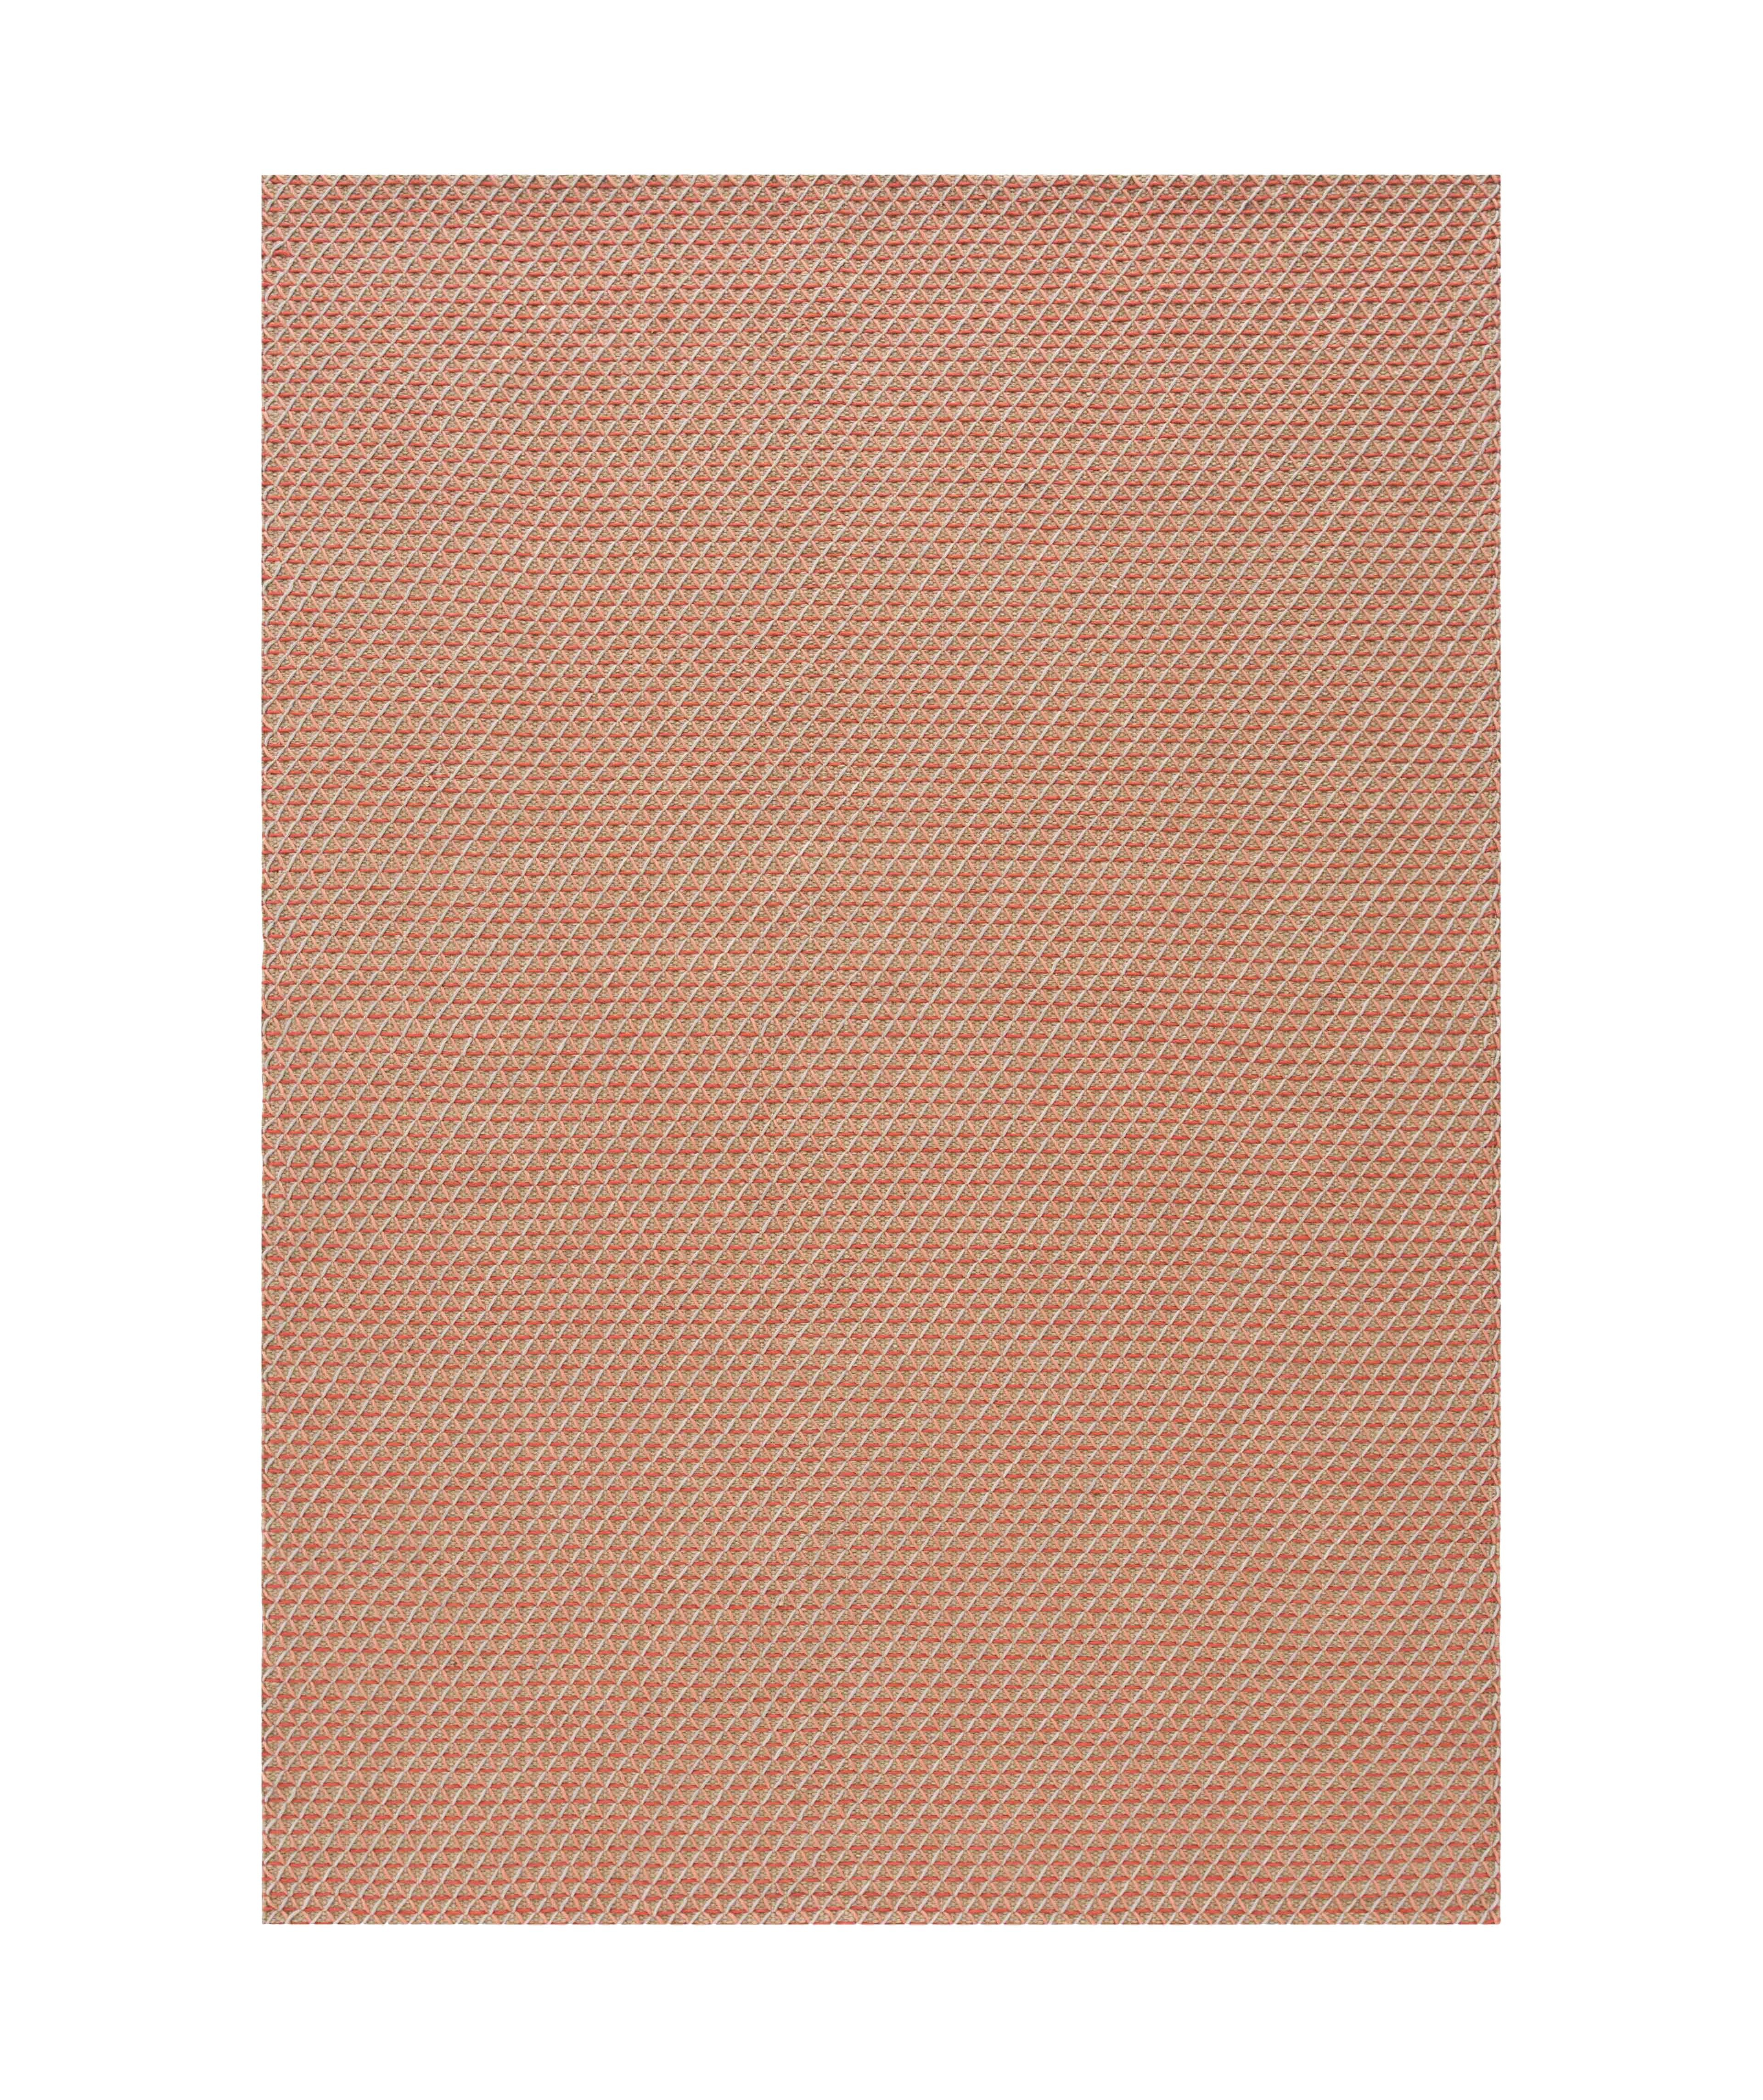 Interni - Tappeti - Tappeto Raw / 170 x 240 cm - Iuta & lana - Gan - Rose/ Iuta naturale - Jute naturelle, Lana